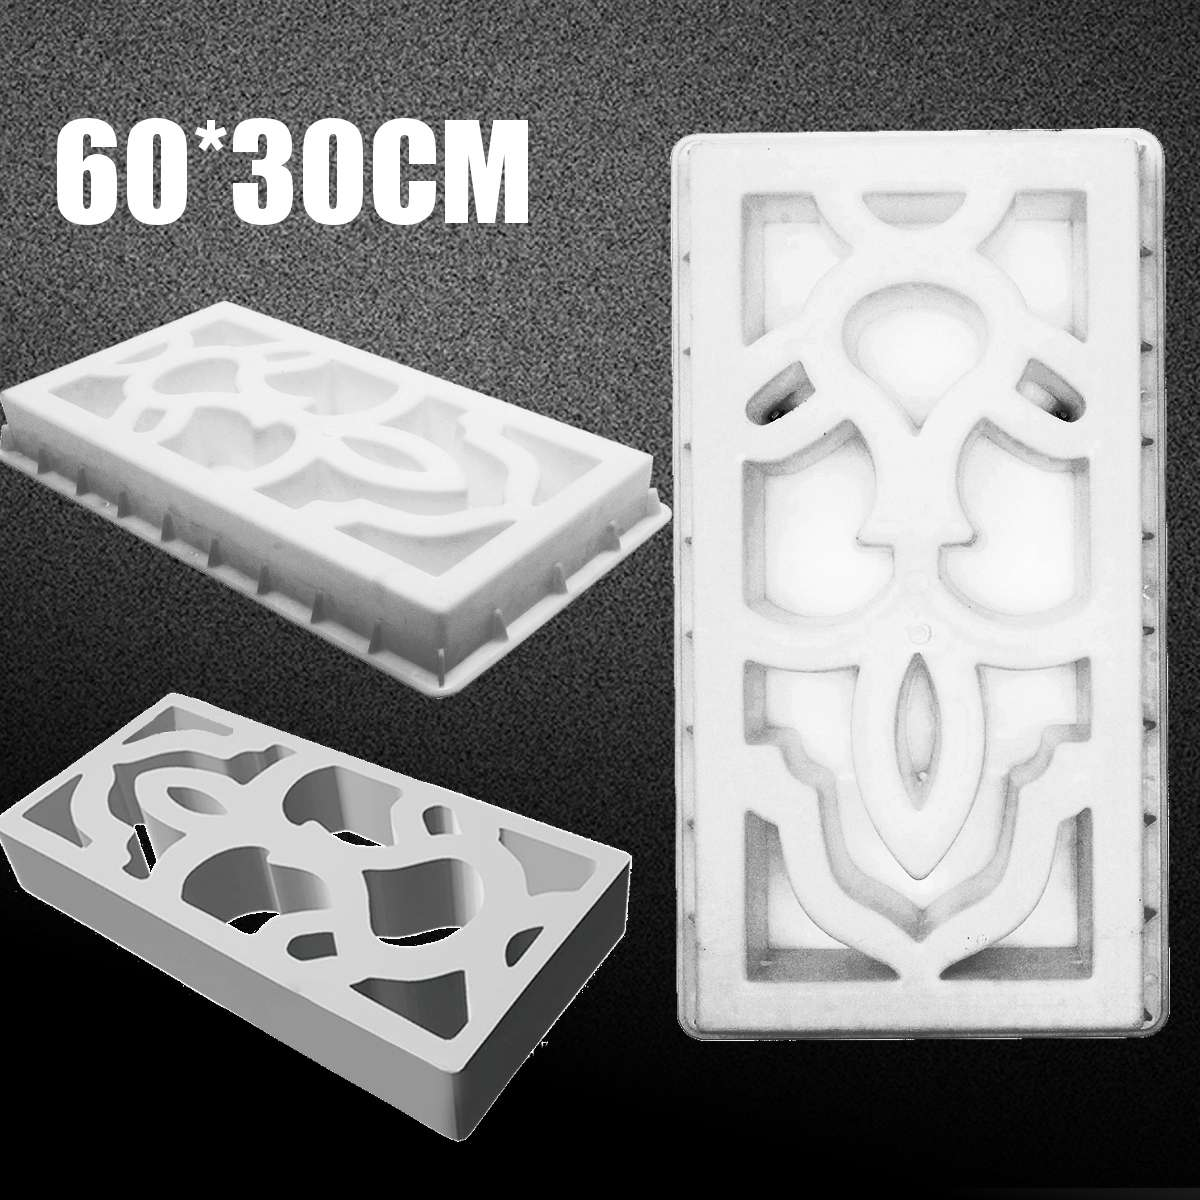 60X30X8CM White Concrete Molds DIY Antique Window Scenic Wall Plastic Mold Cement Brick Concrete Mold Great For Paving Molds